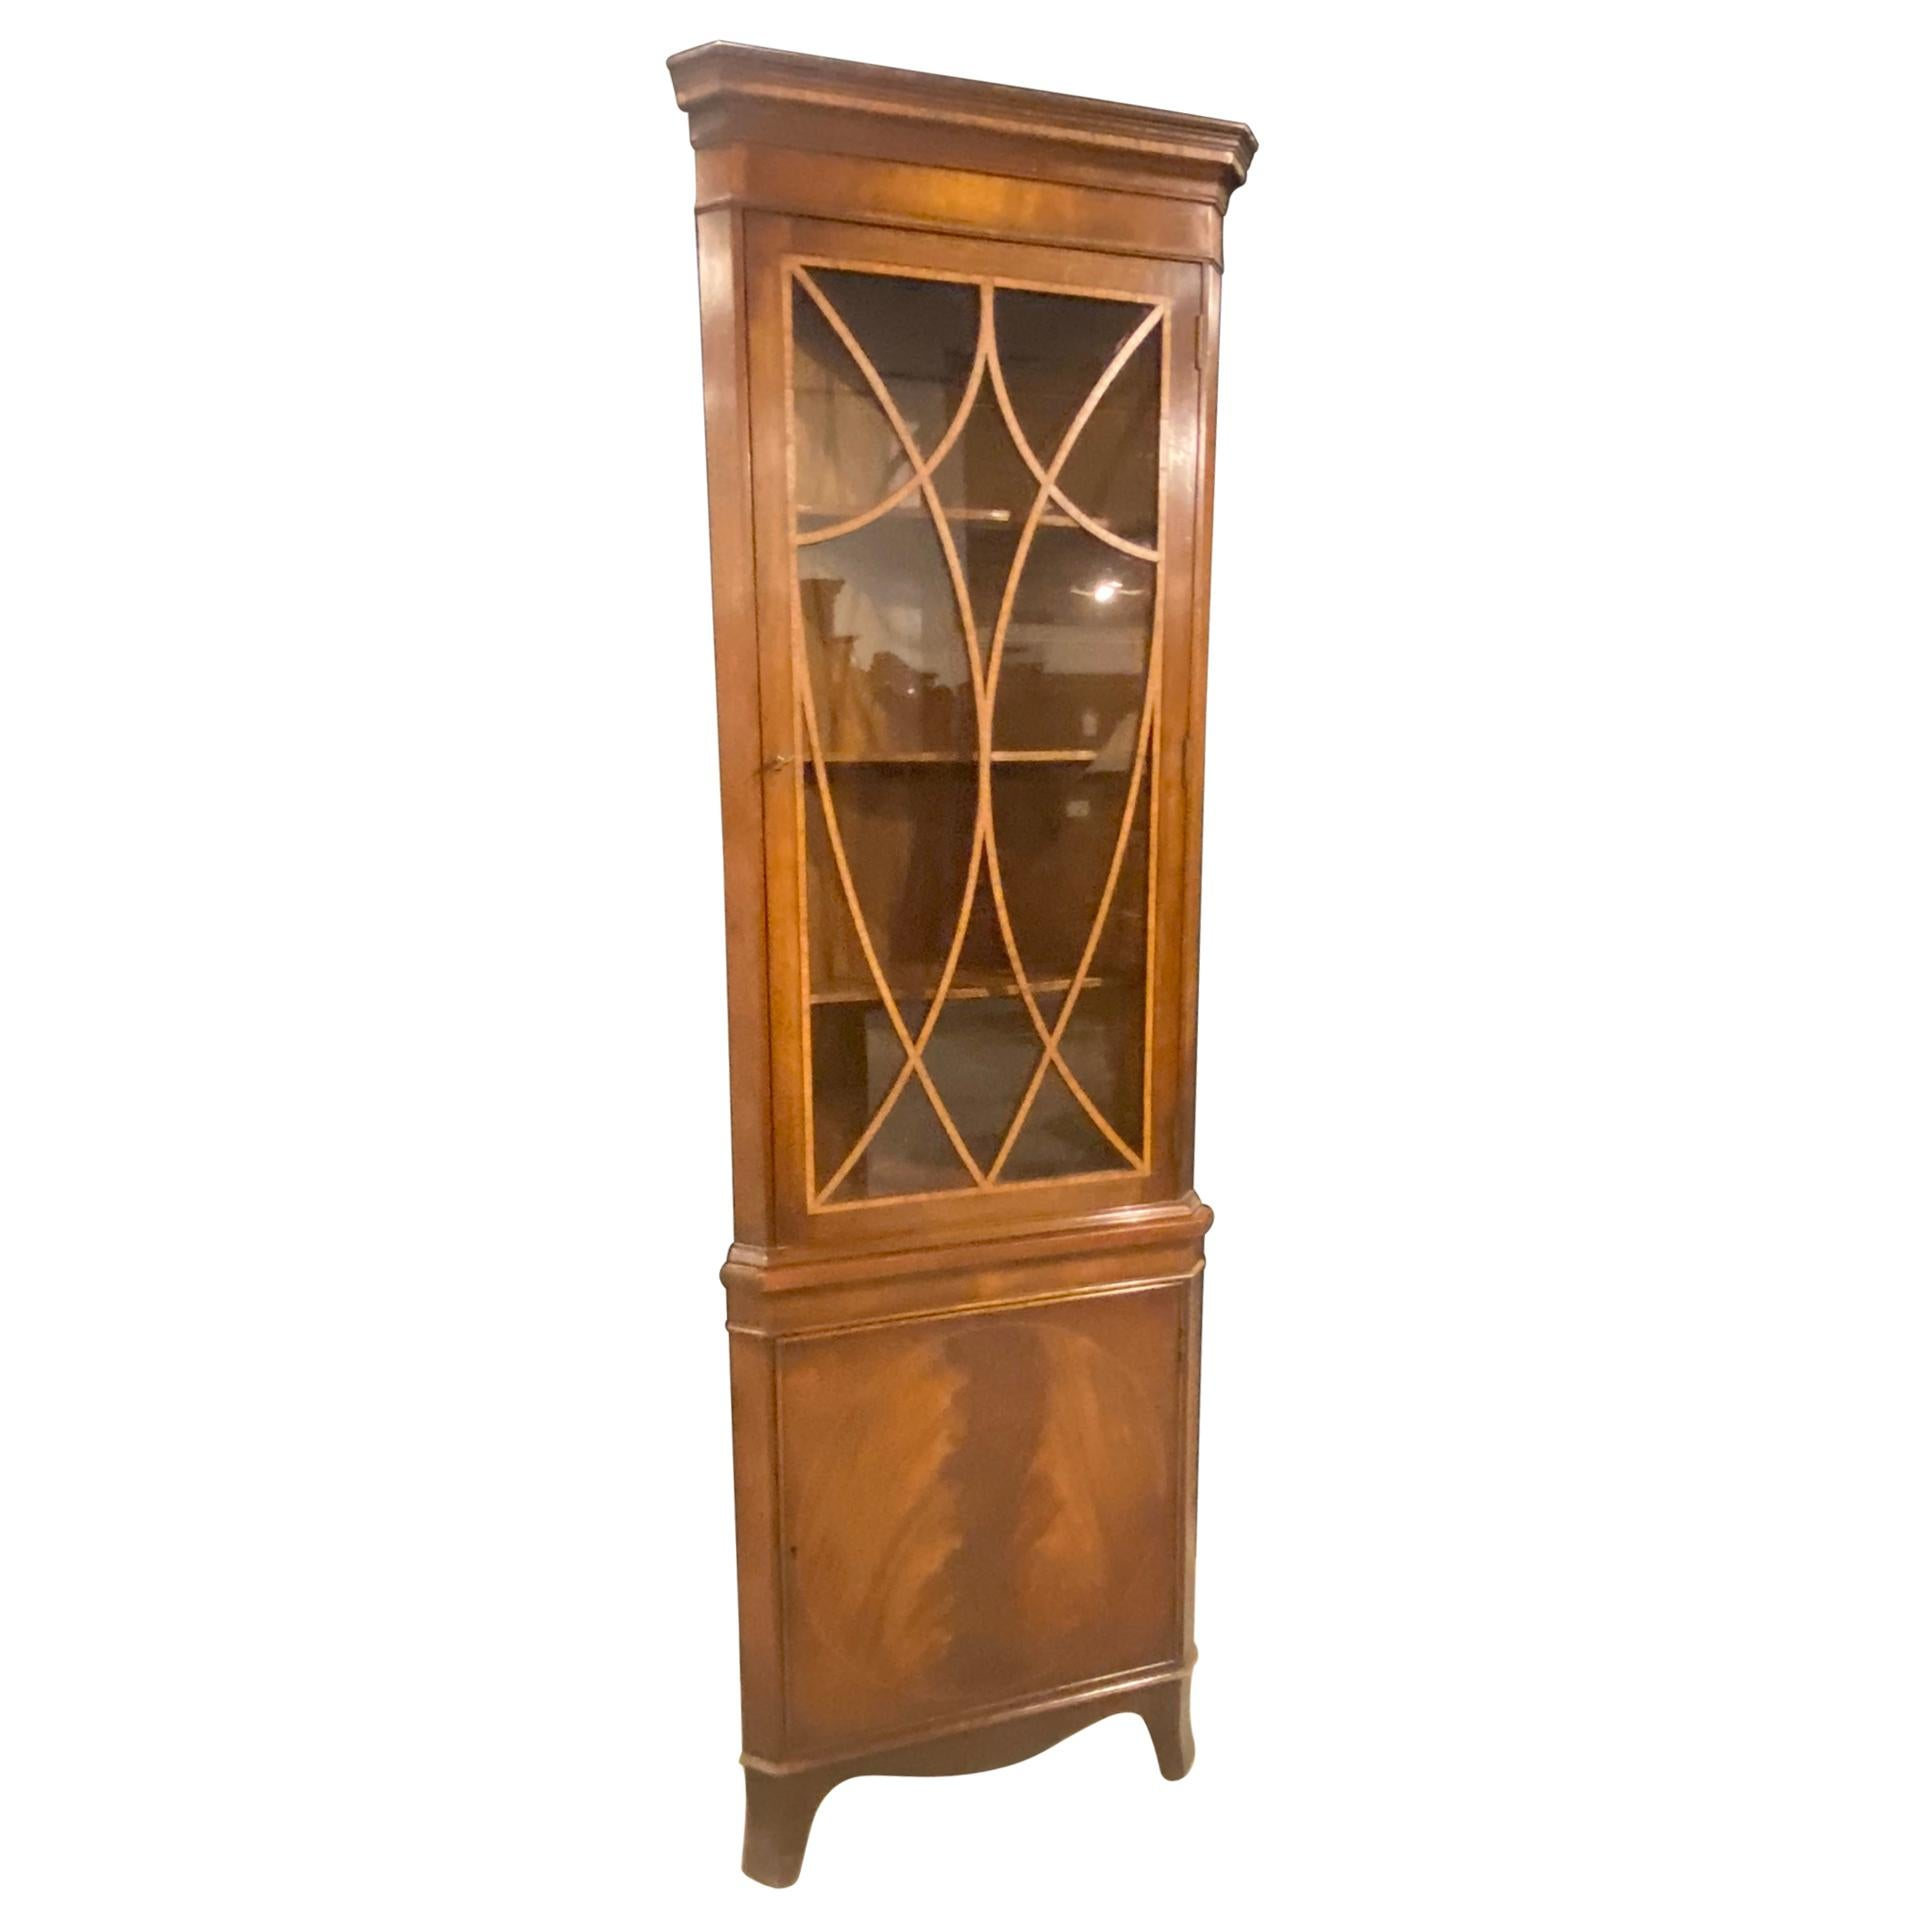 18th Century Style Corner Cabinet, Mahogany with Satinwood and Figured Mahogany